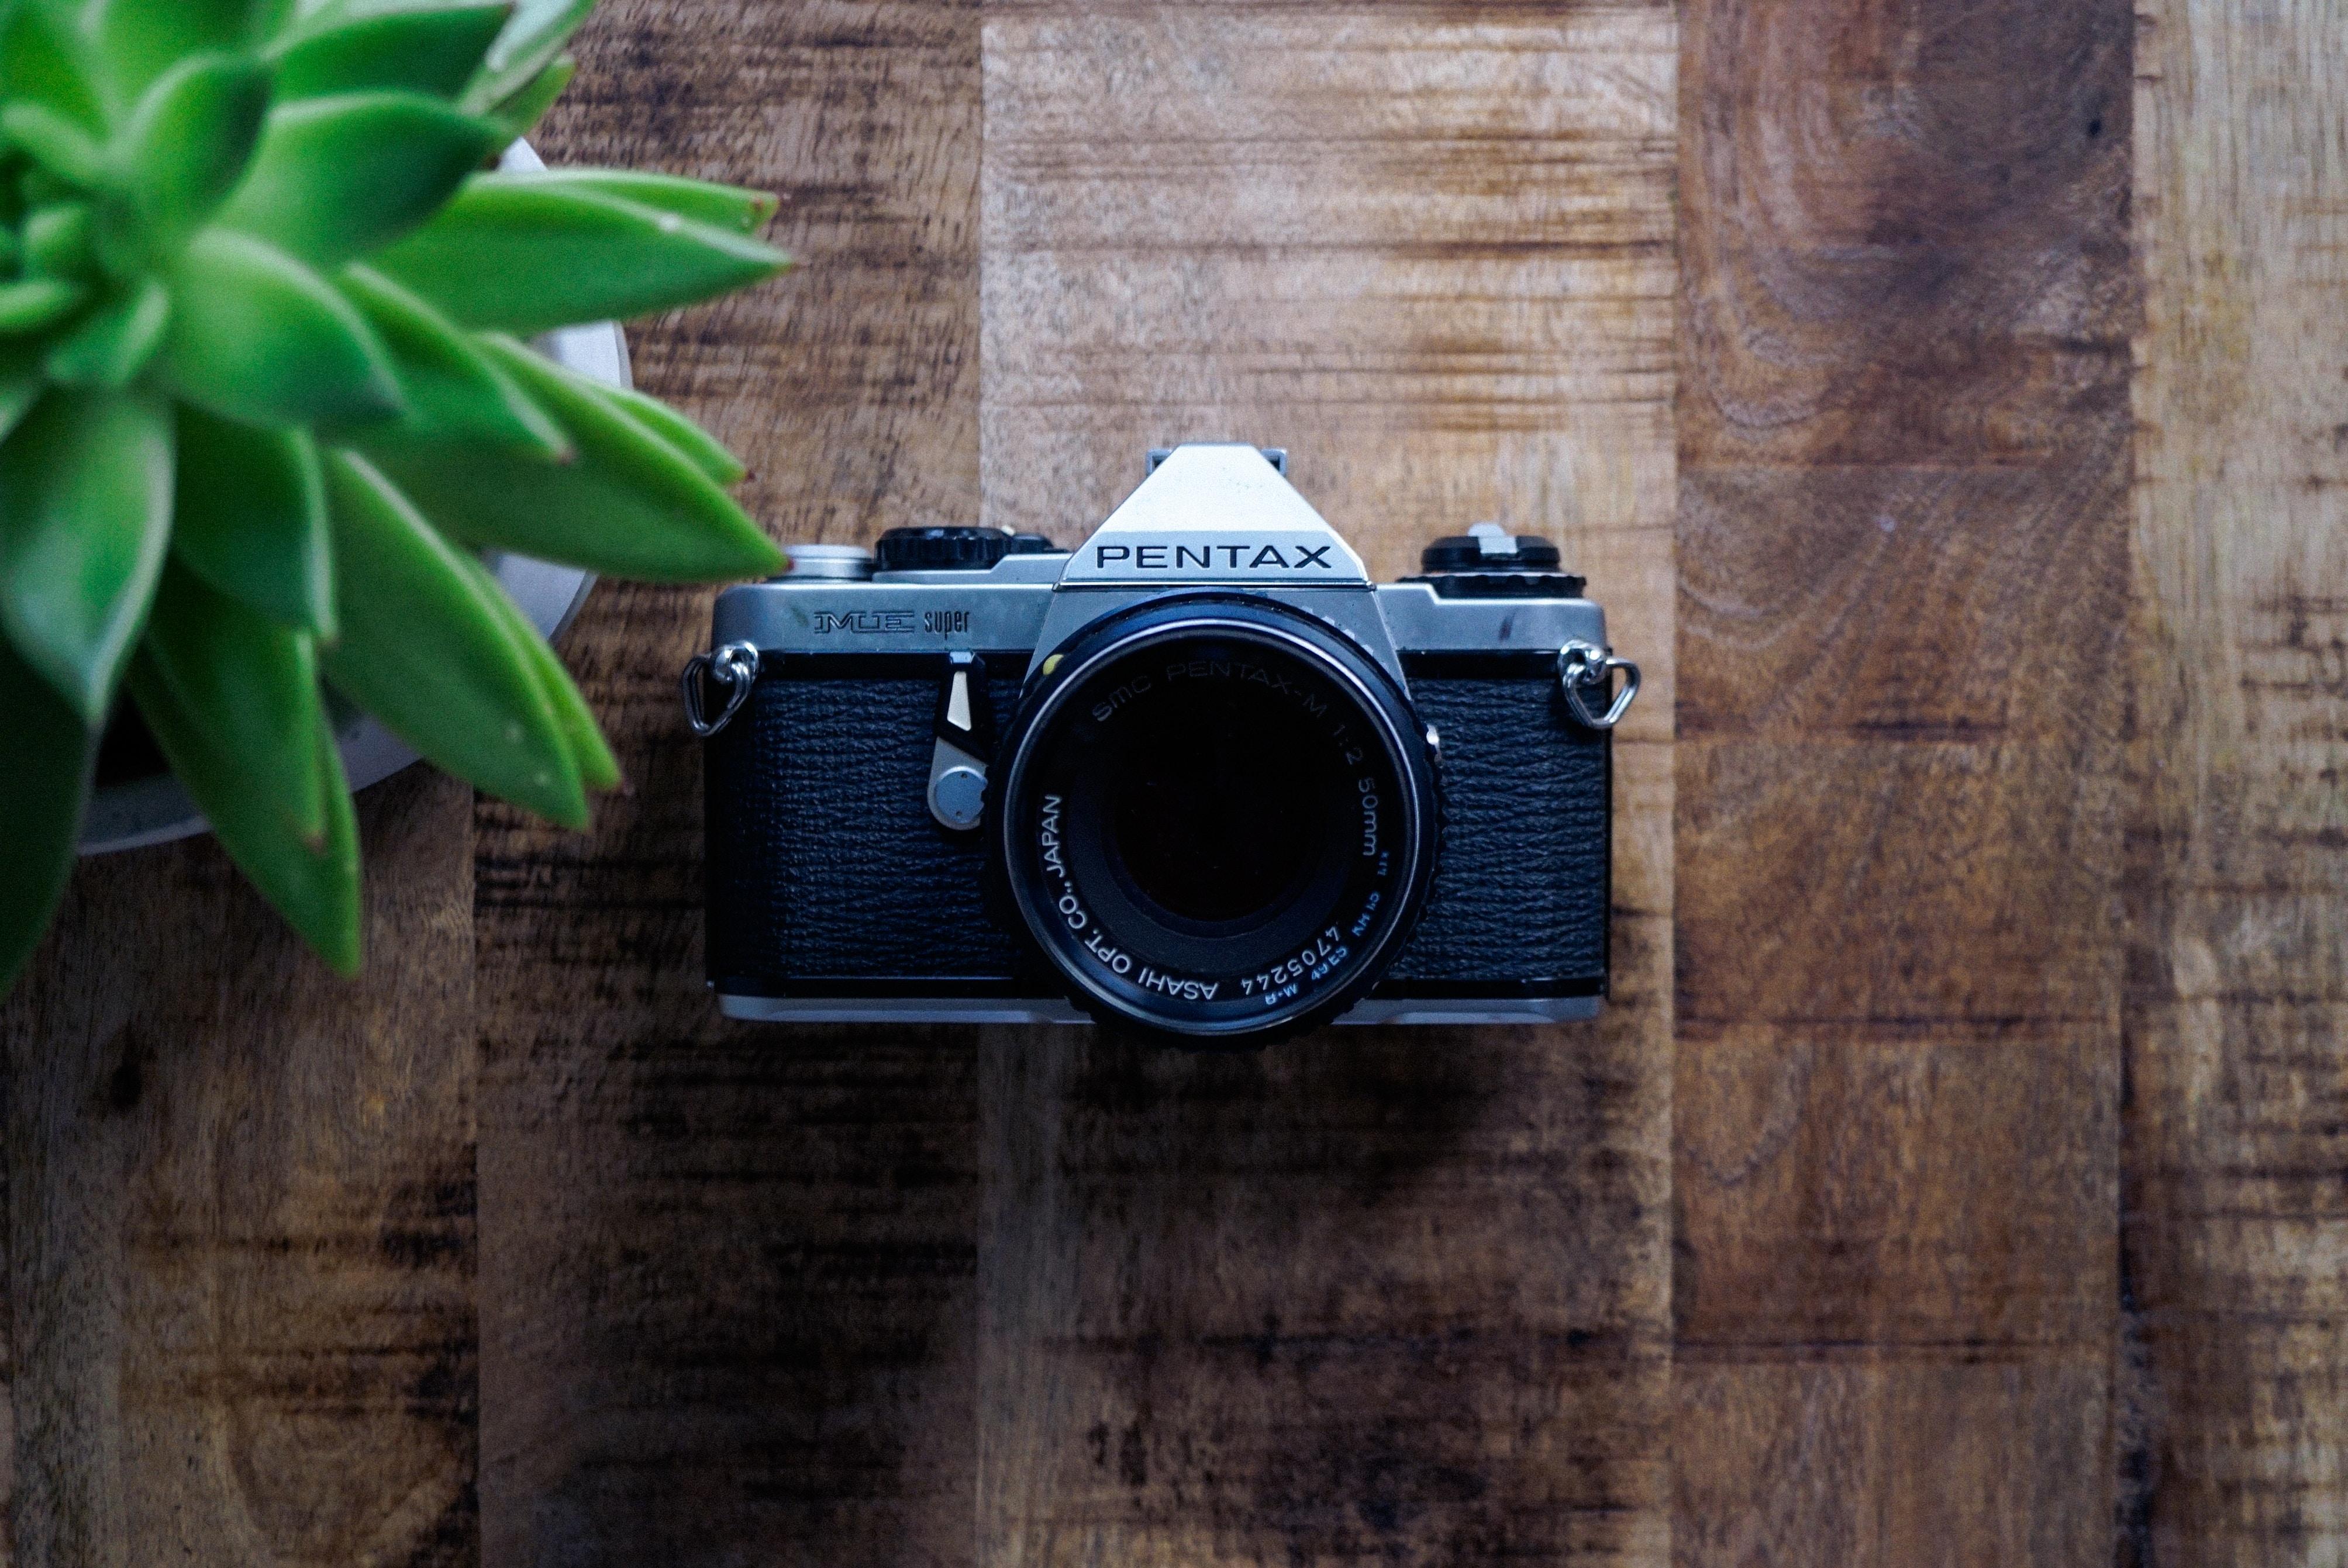 Pentax camera beside plant